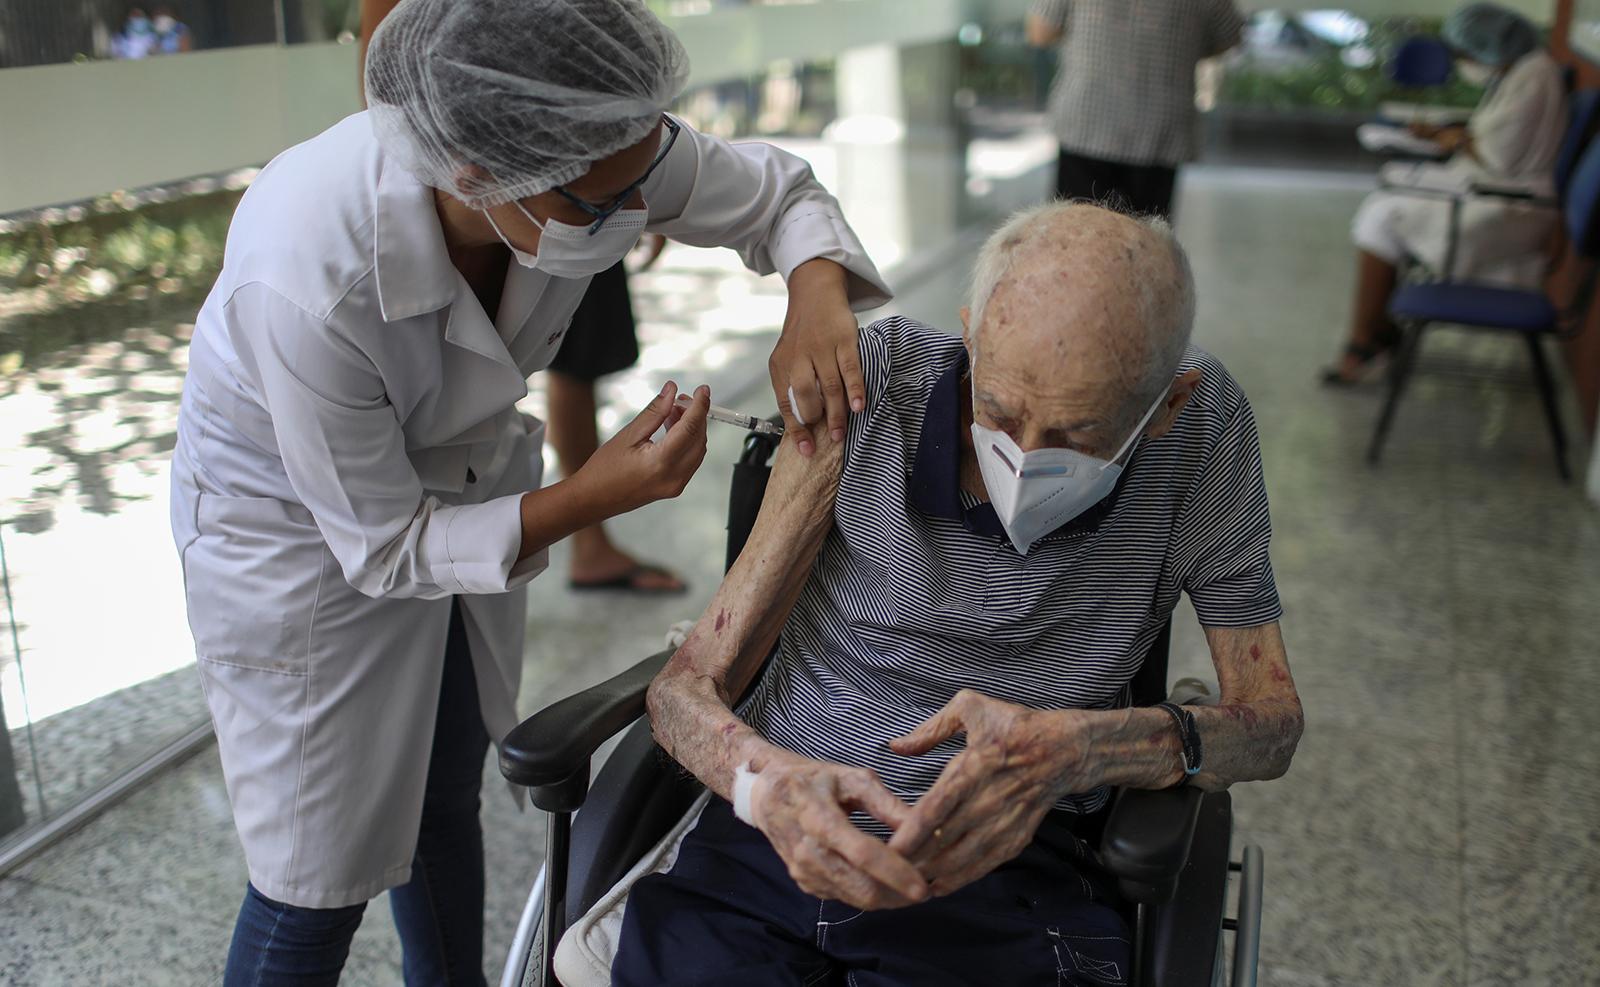 Journalist Helio Fernandes, 100, receives the AstraZeneca/Oxford vaccine for the coronavirus disease (COVID-19) at a public hospital in Rio de Janeiro, Brazil, February 1, 2021. REUTERS